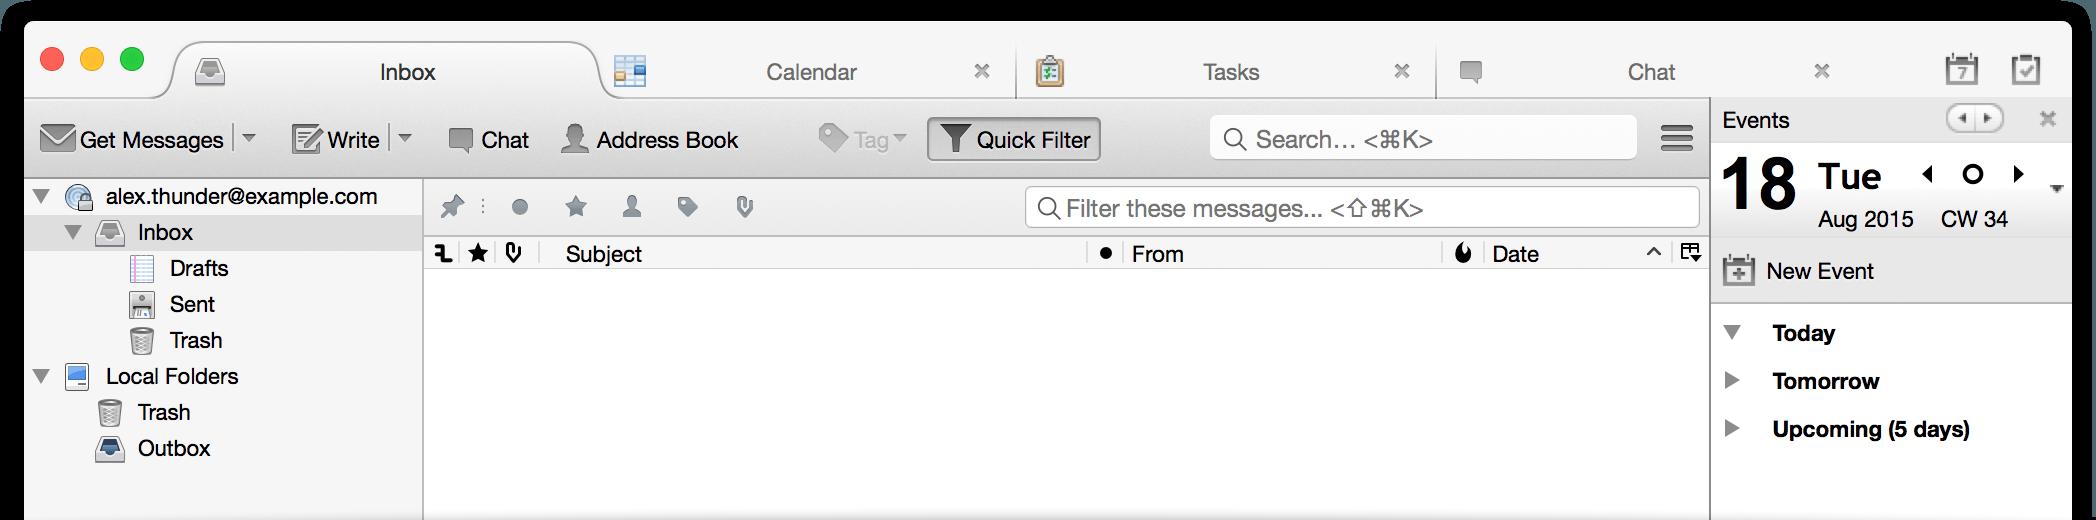 screenshot-mac-high-res.png